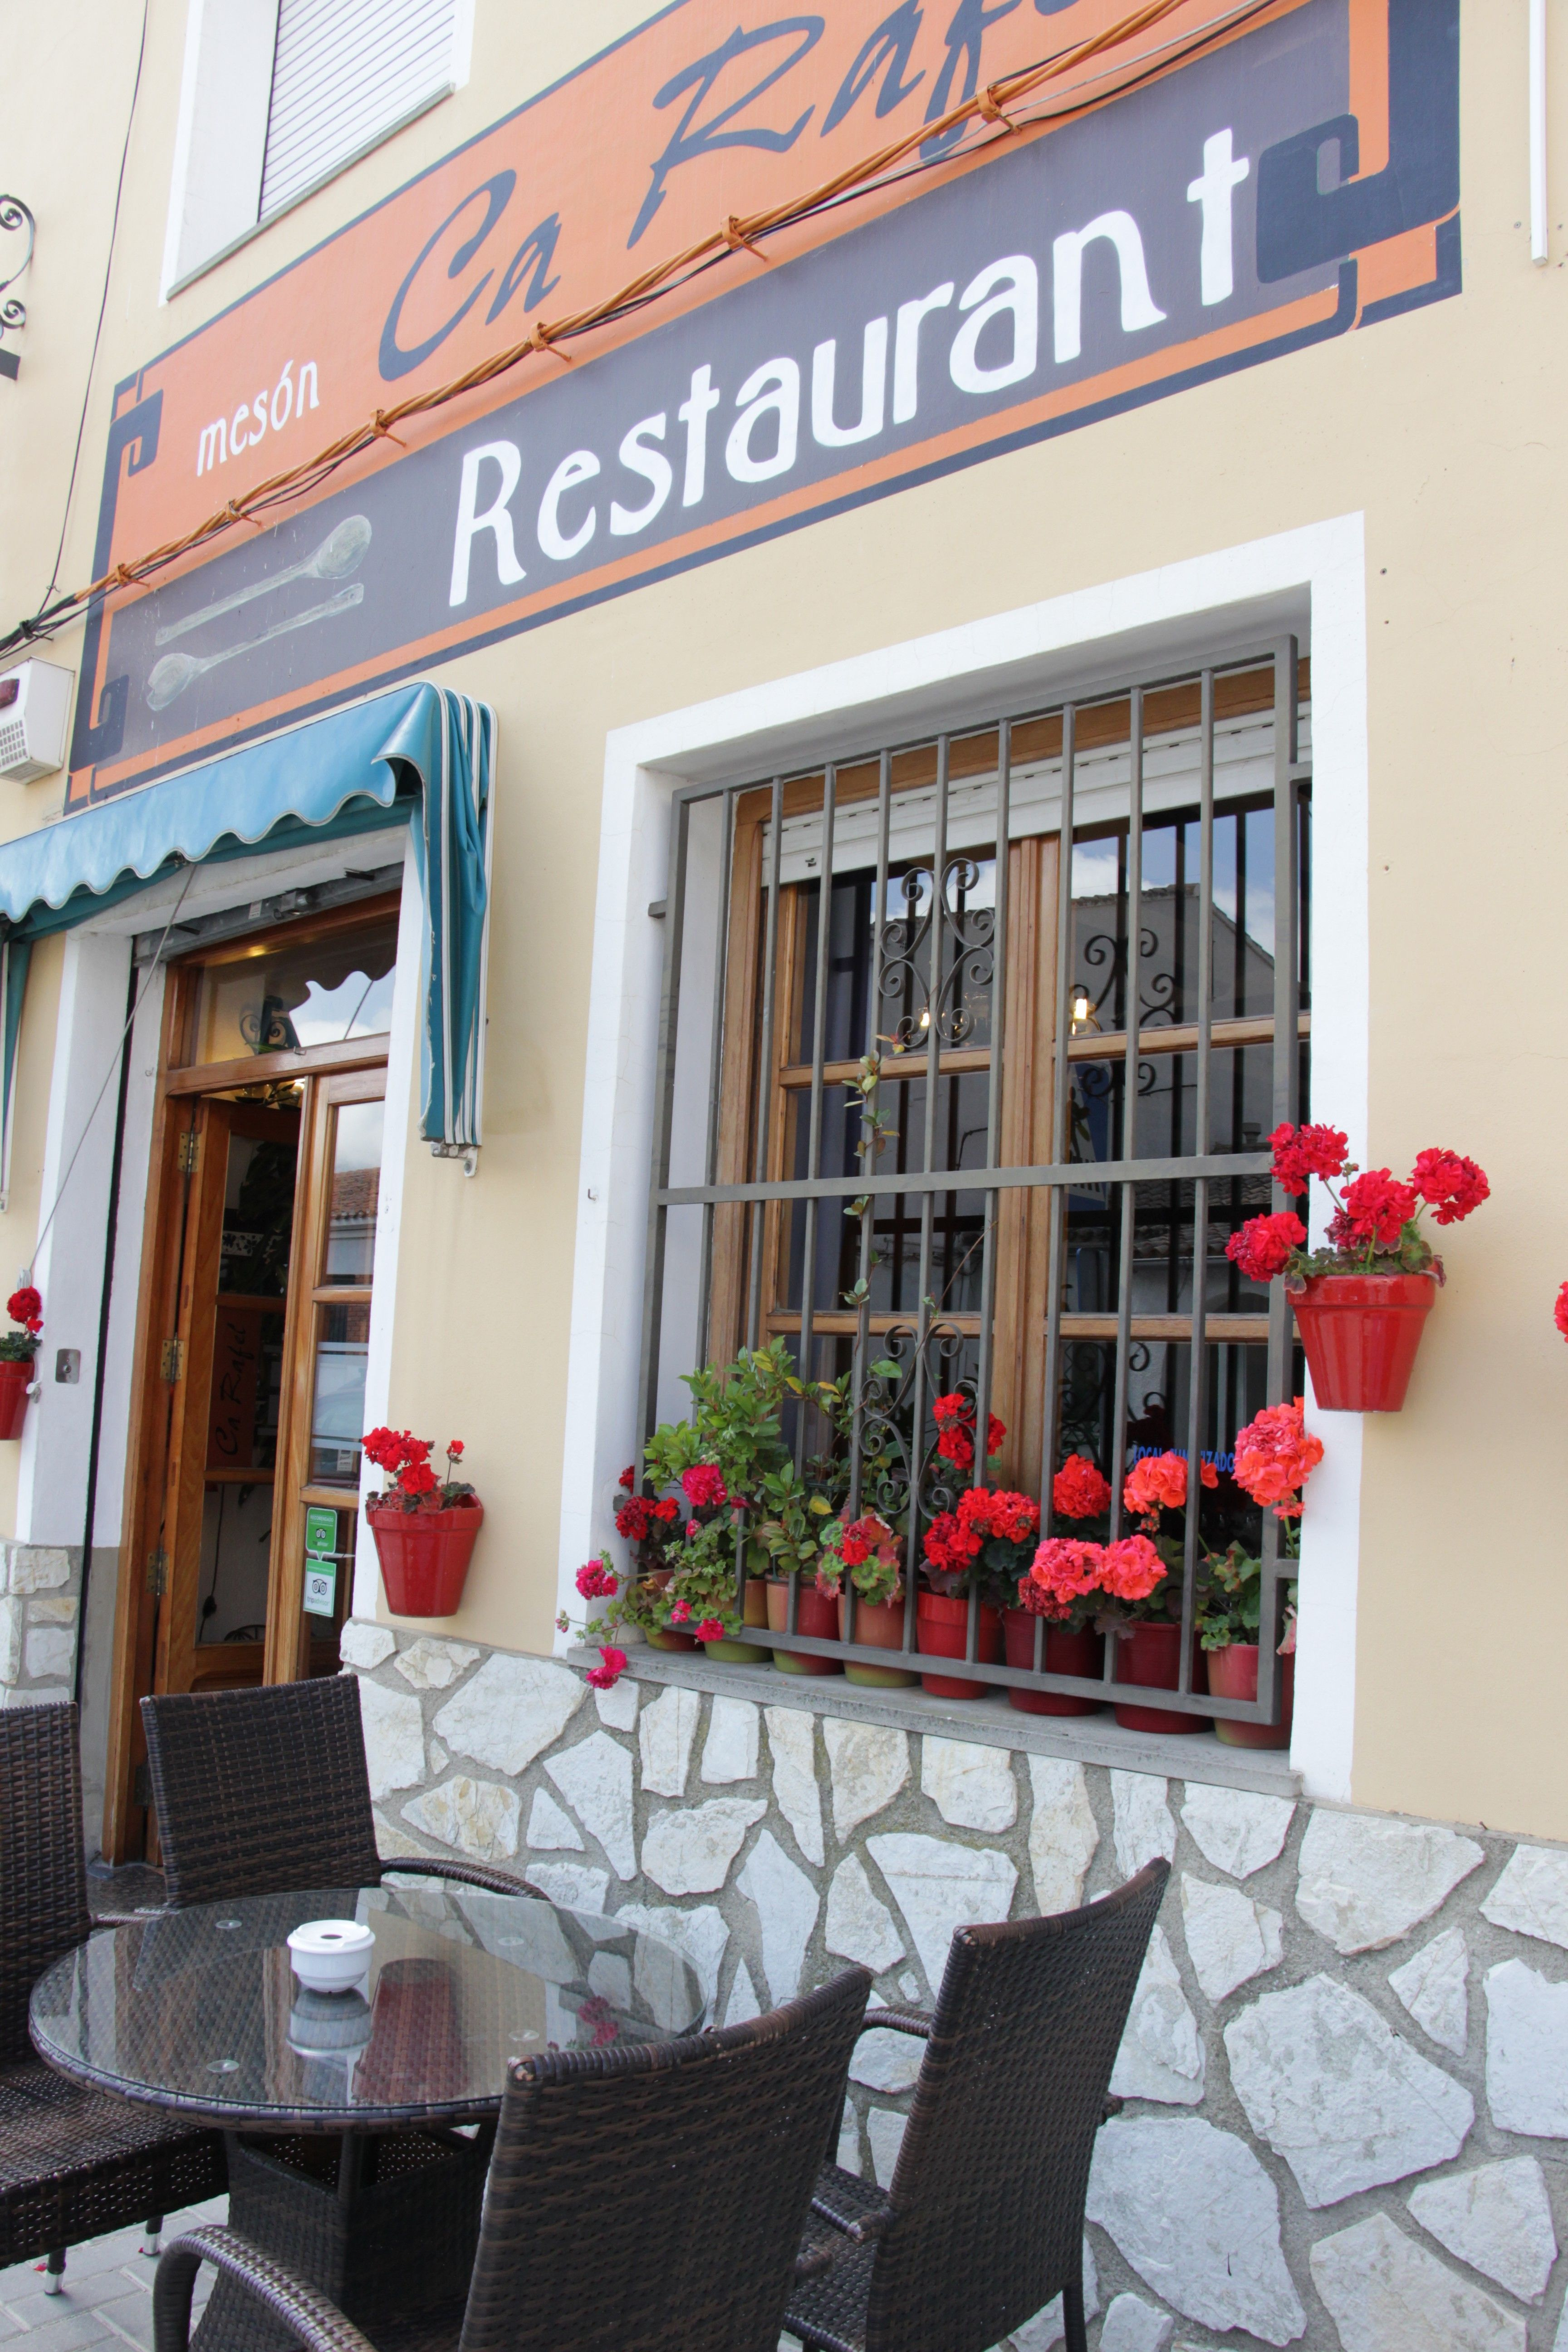 Foto 9 de Mesón - restaurante en Benimantell | Mesón Ca Rafel